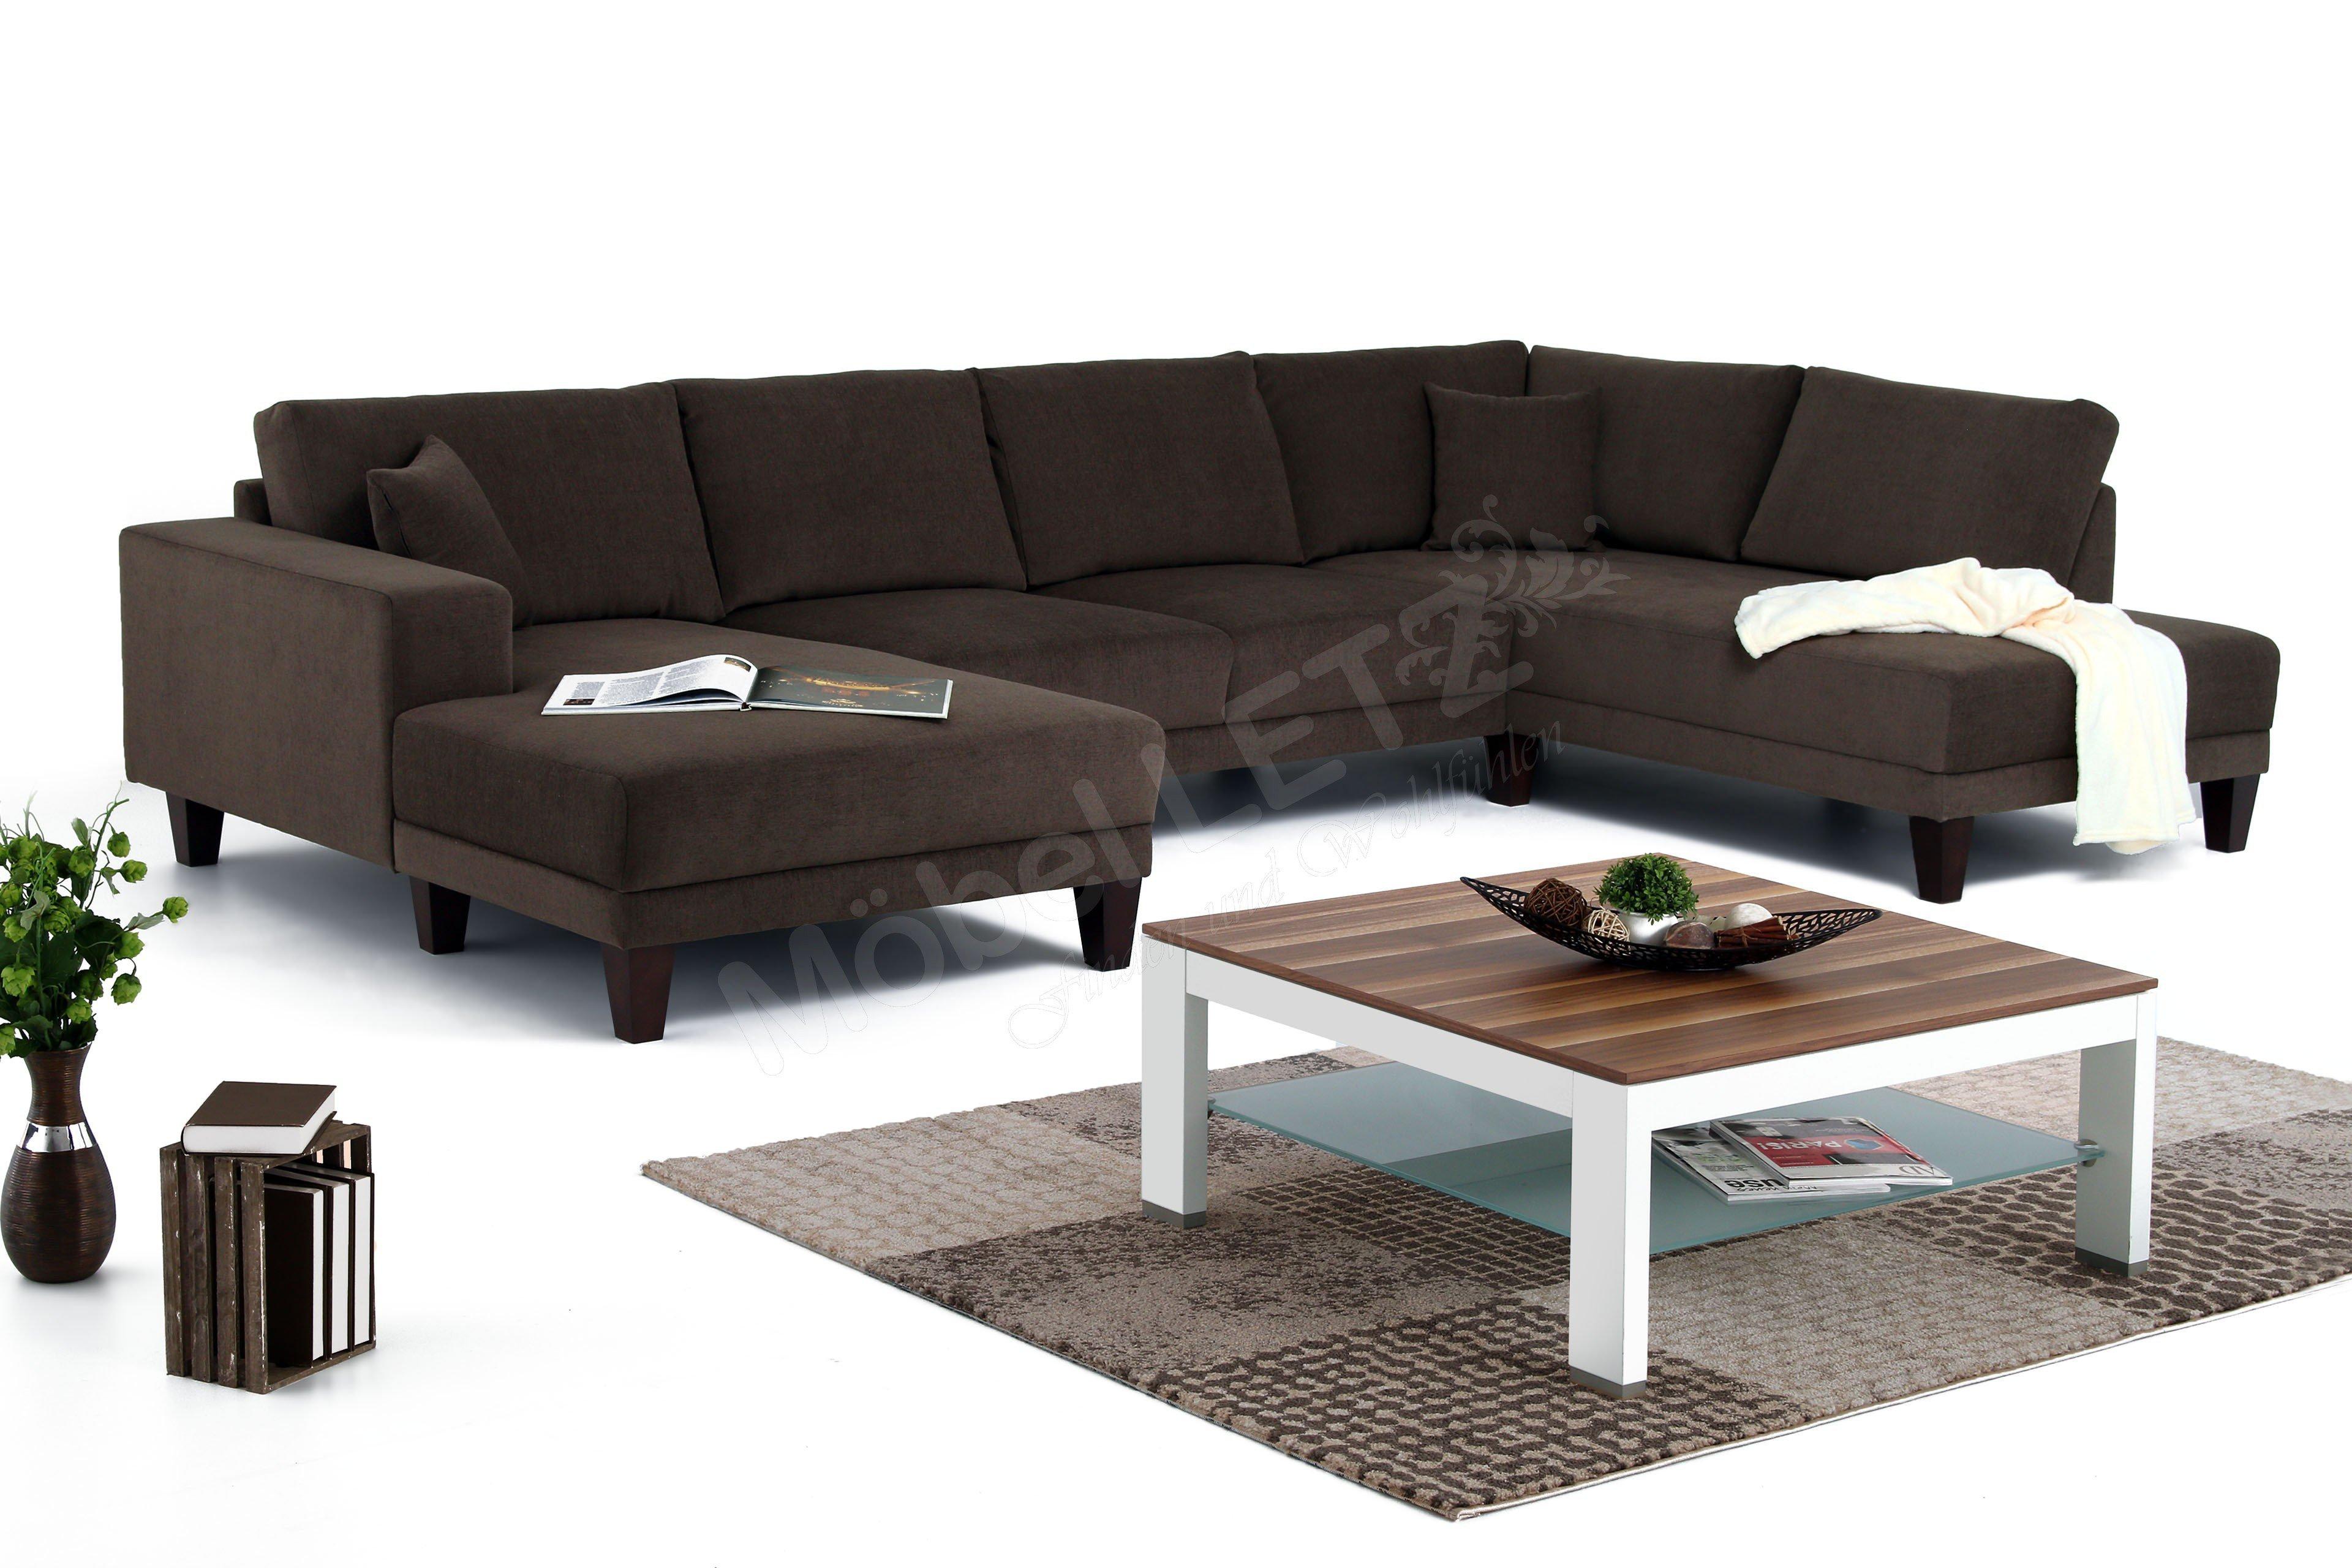 candy modesto polstergarnitur in mocca m bel letz ihr online shop. Black Bedroom Furniture Sets. Home Design Ideas